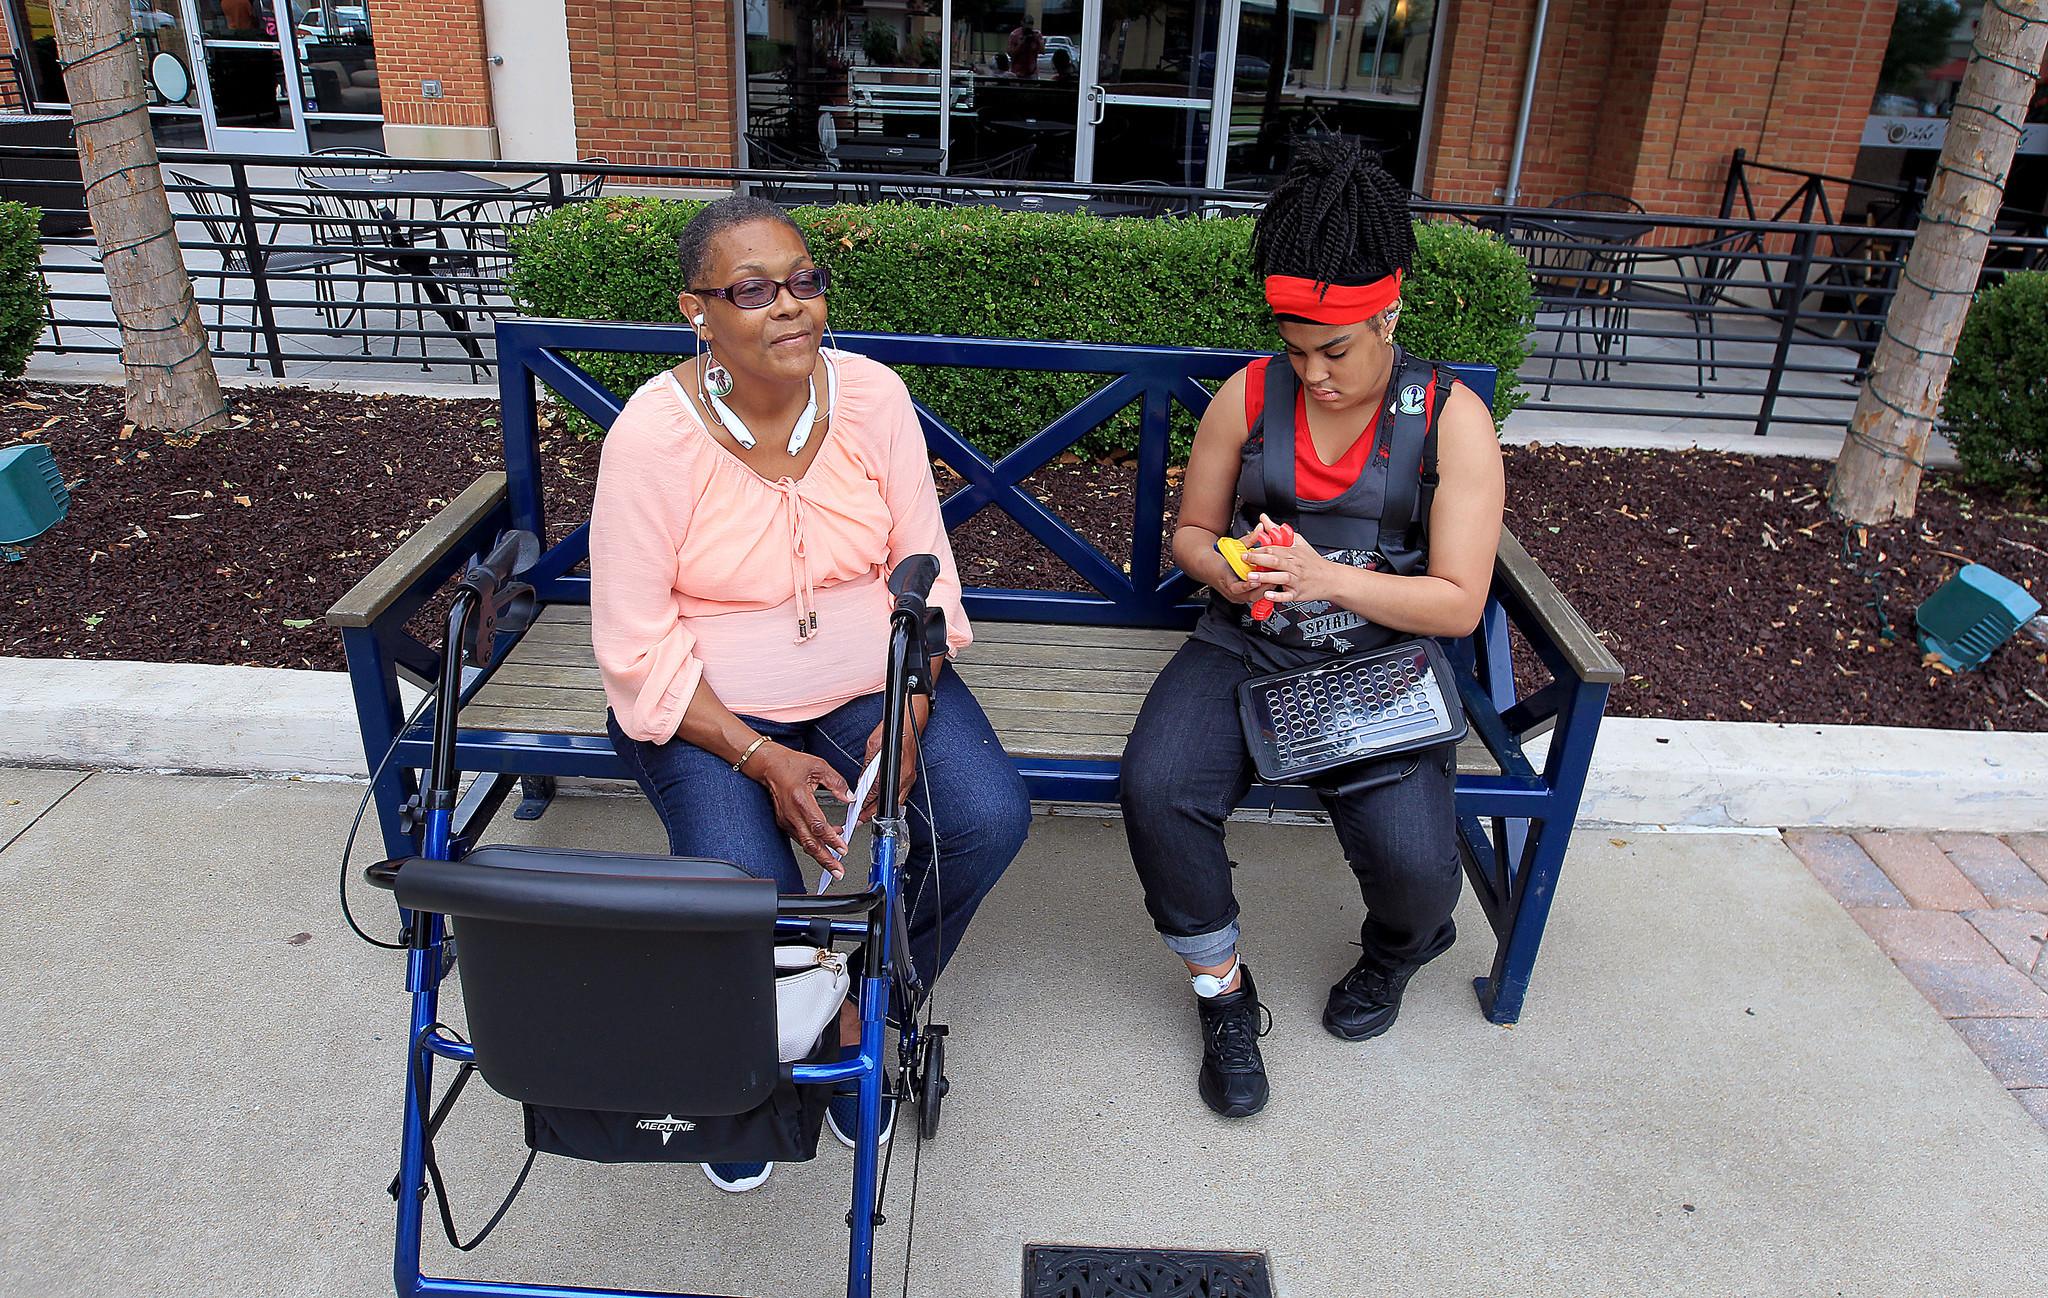 Project Lifesaver: Ankle Bracelet - Daily Press